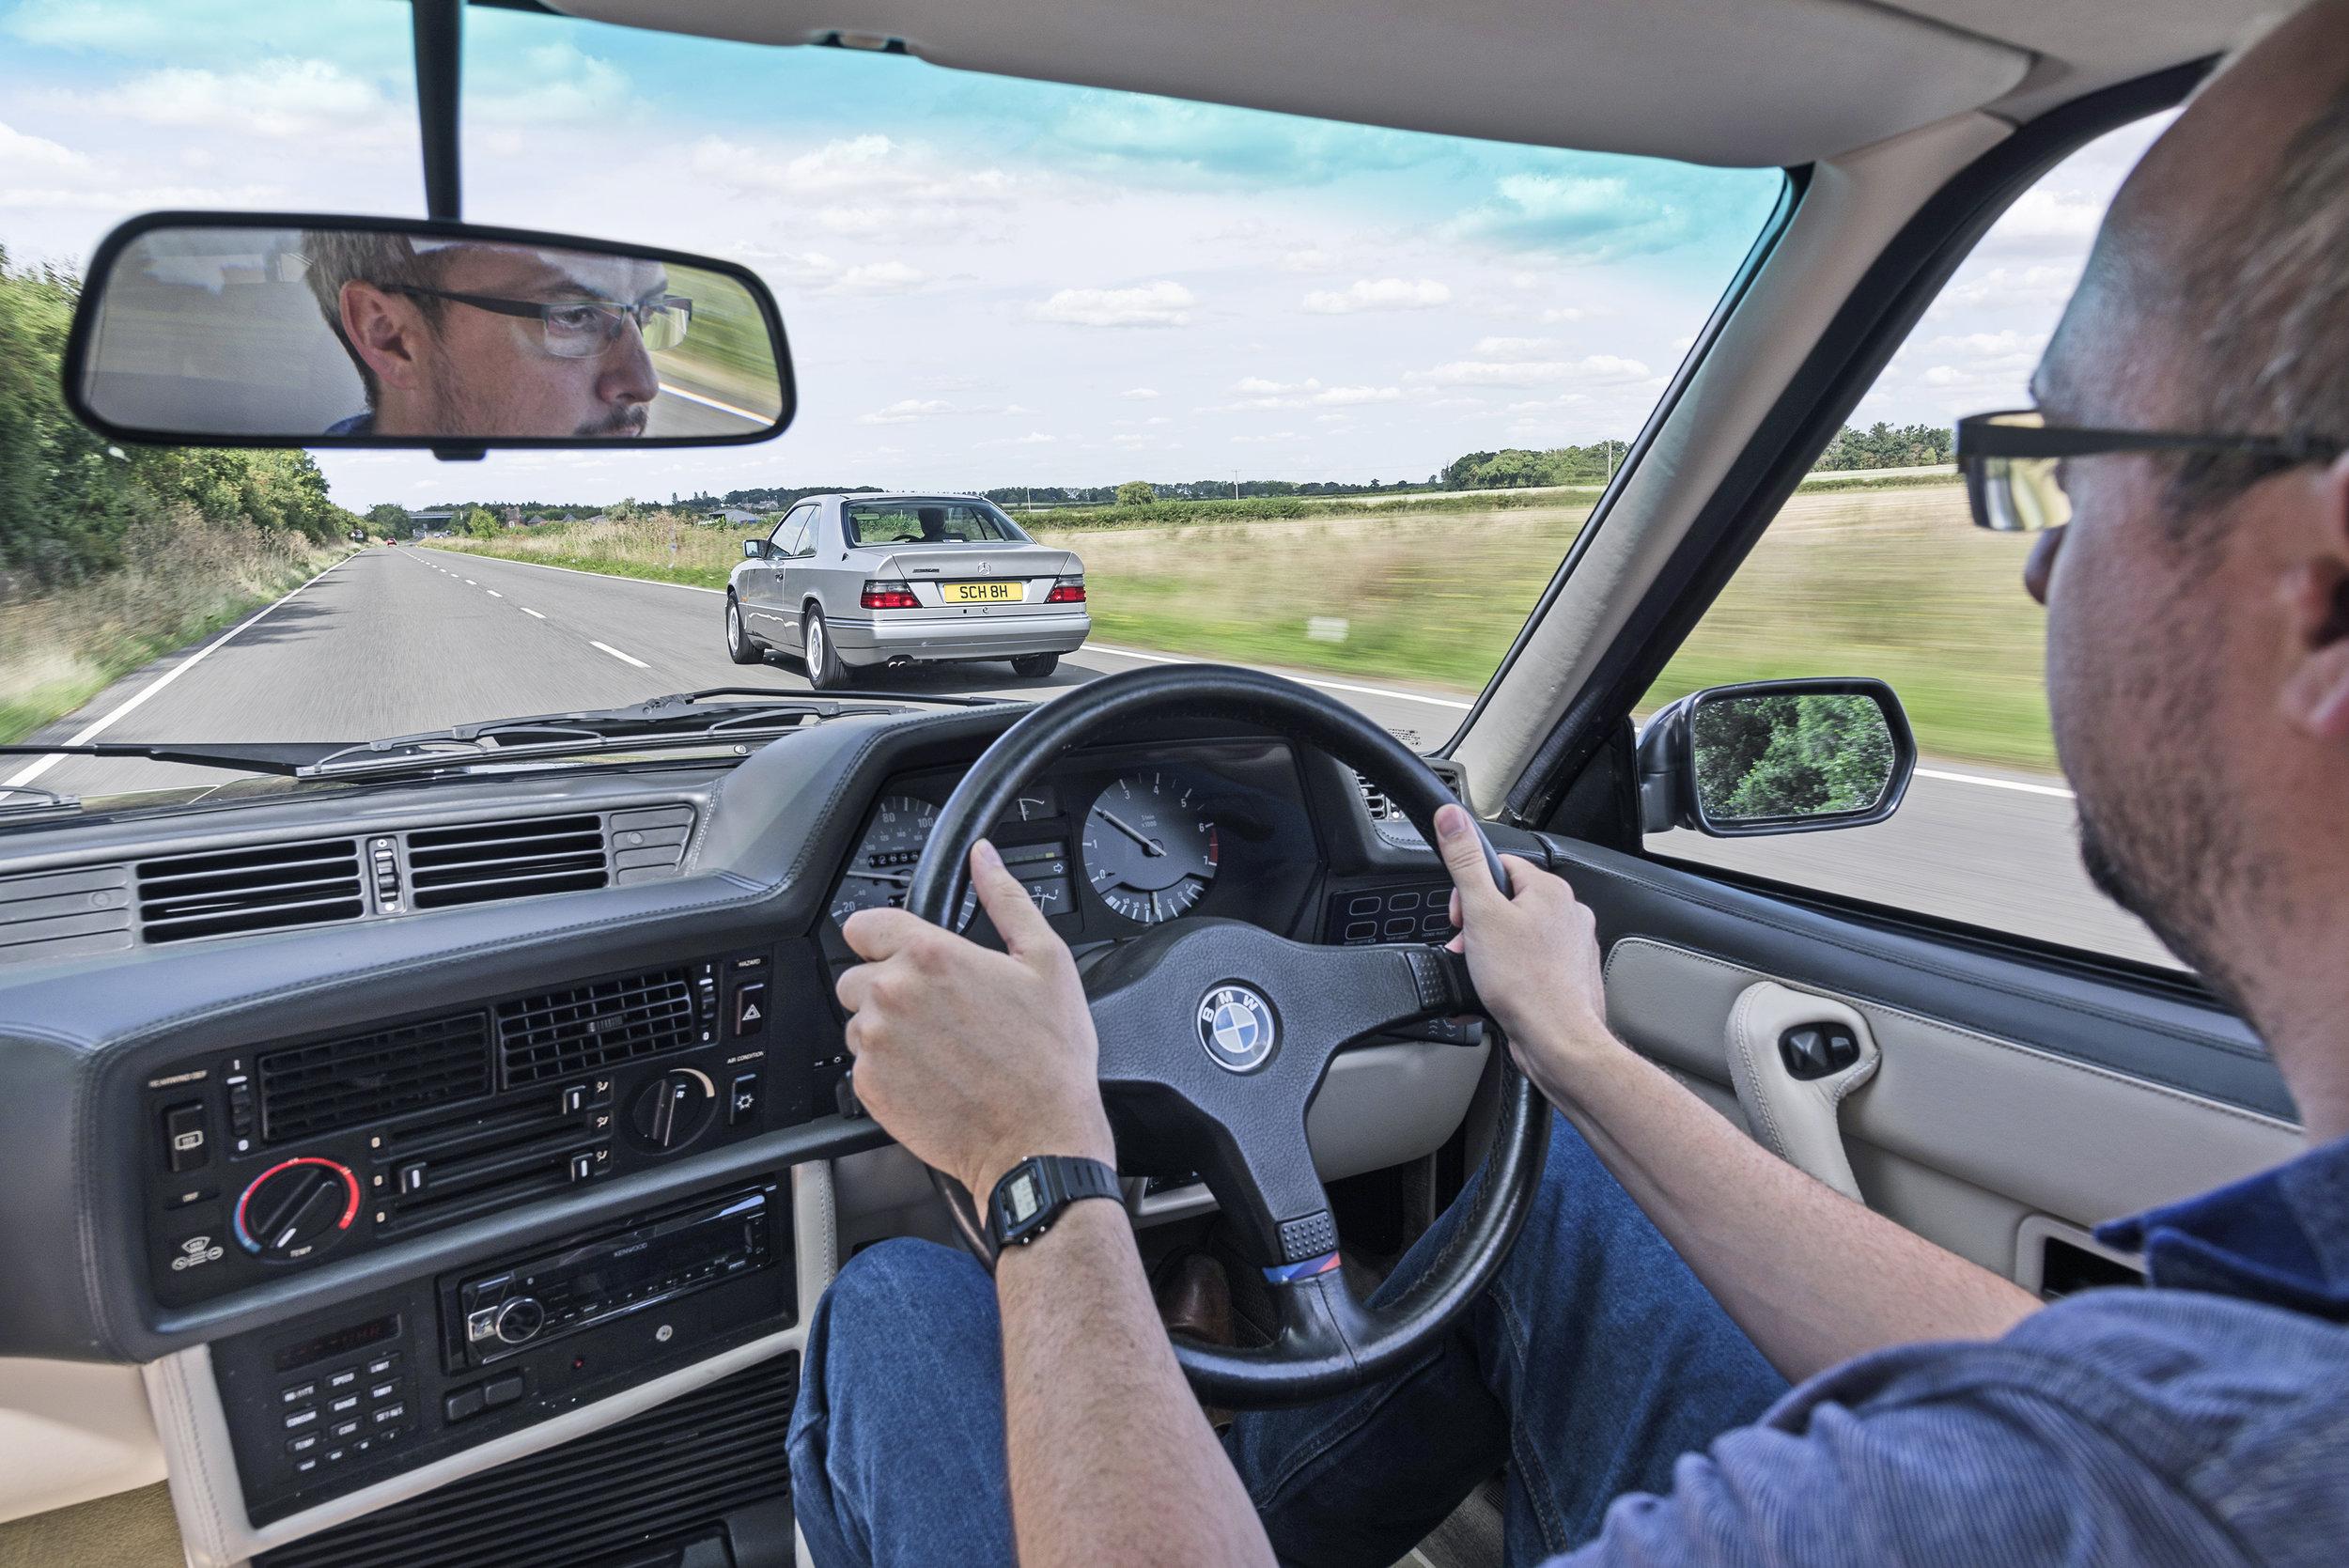 modernclassics-BMW-635i-Mercedes-E320-jordanbutters-101.jpg